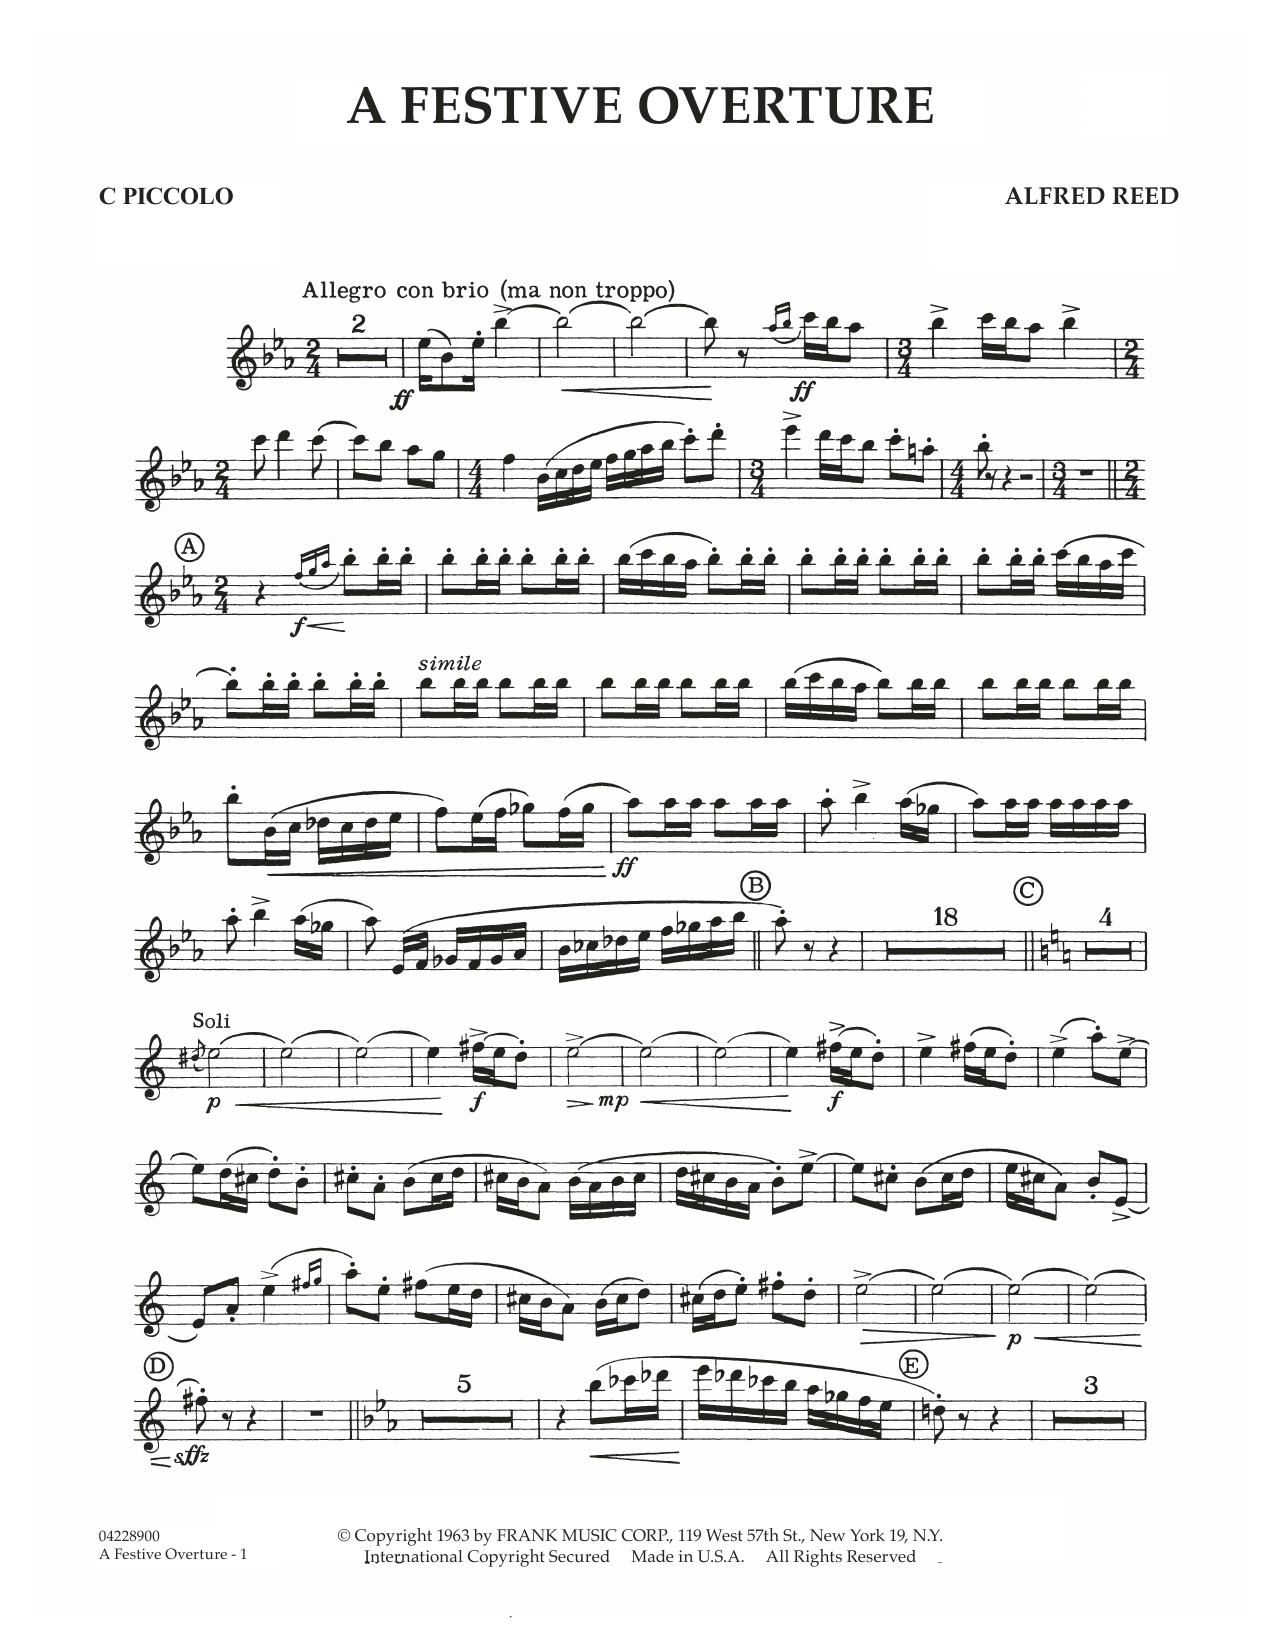 A Festive Overture - C Piccolo (Concert Band)